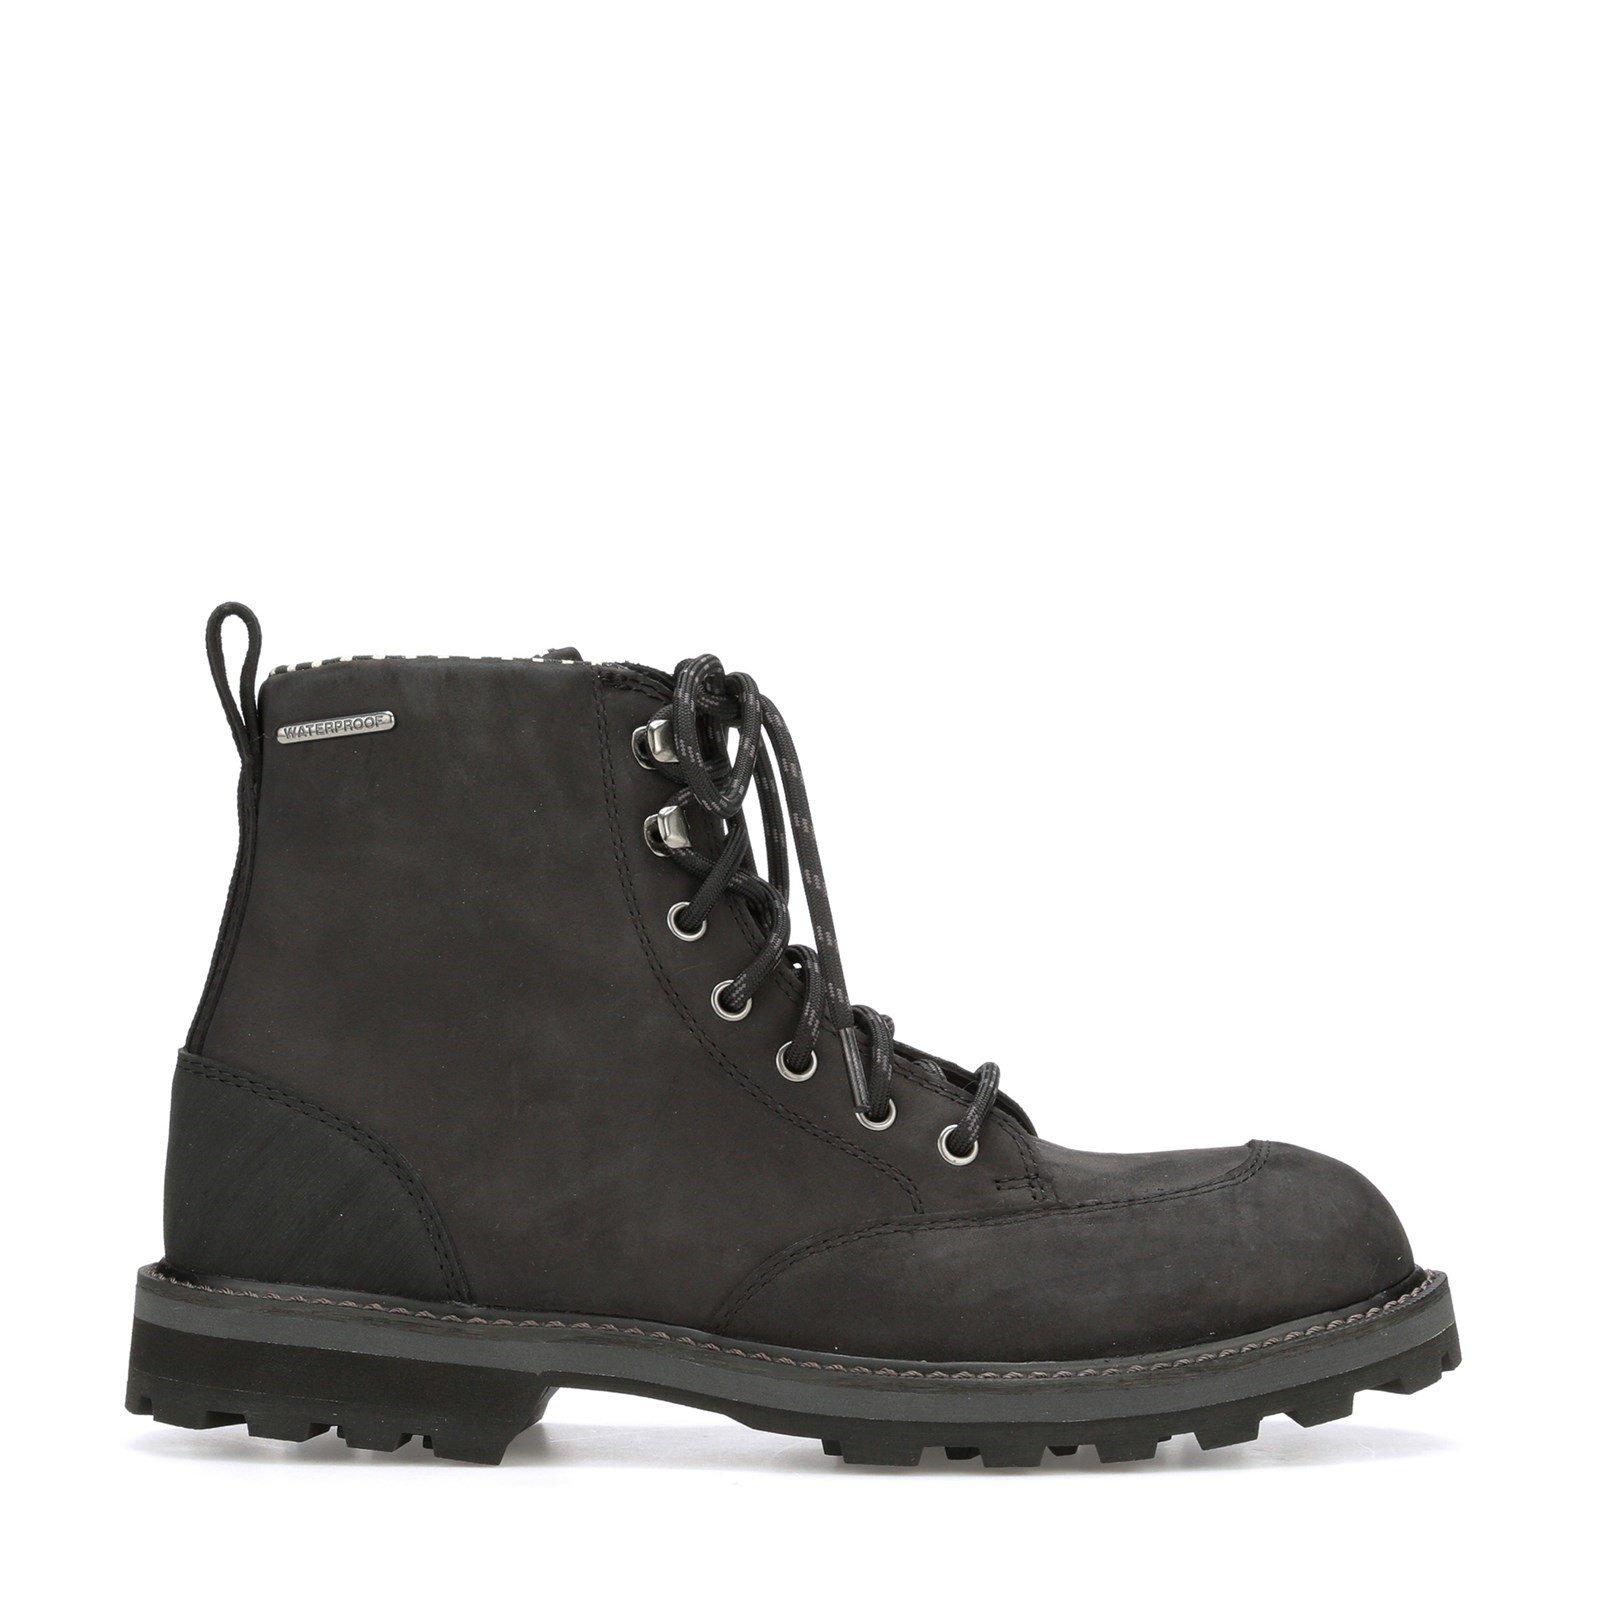 Muck Boots Men's Foreman Boot Black 31854 - Black 11